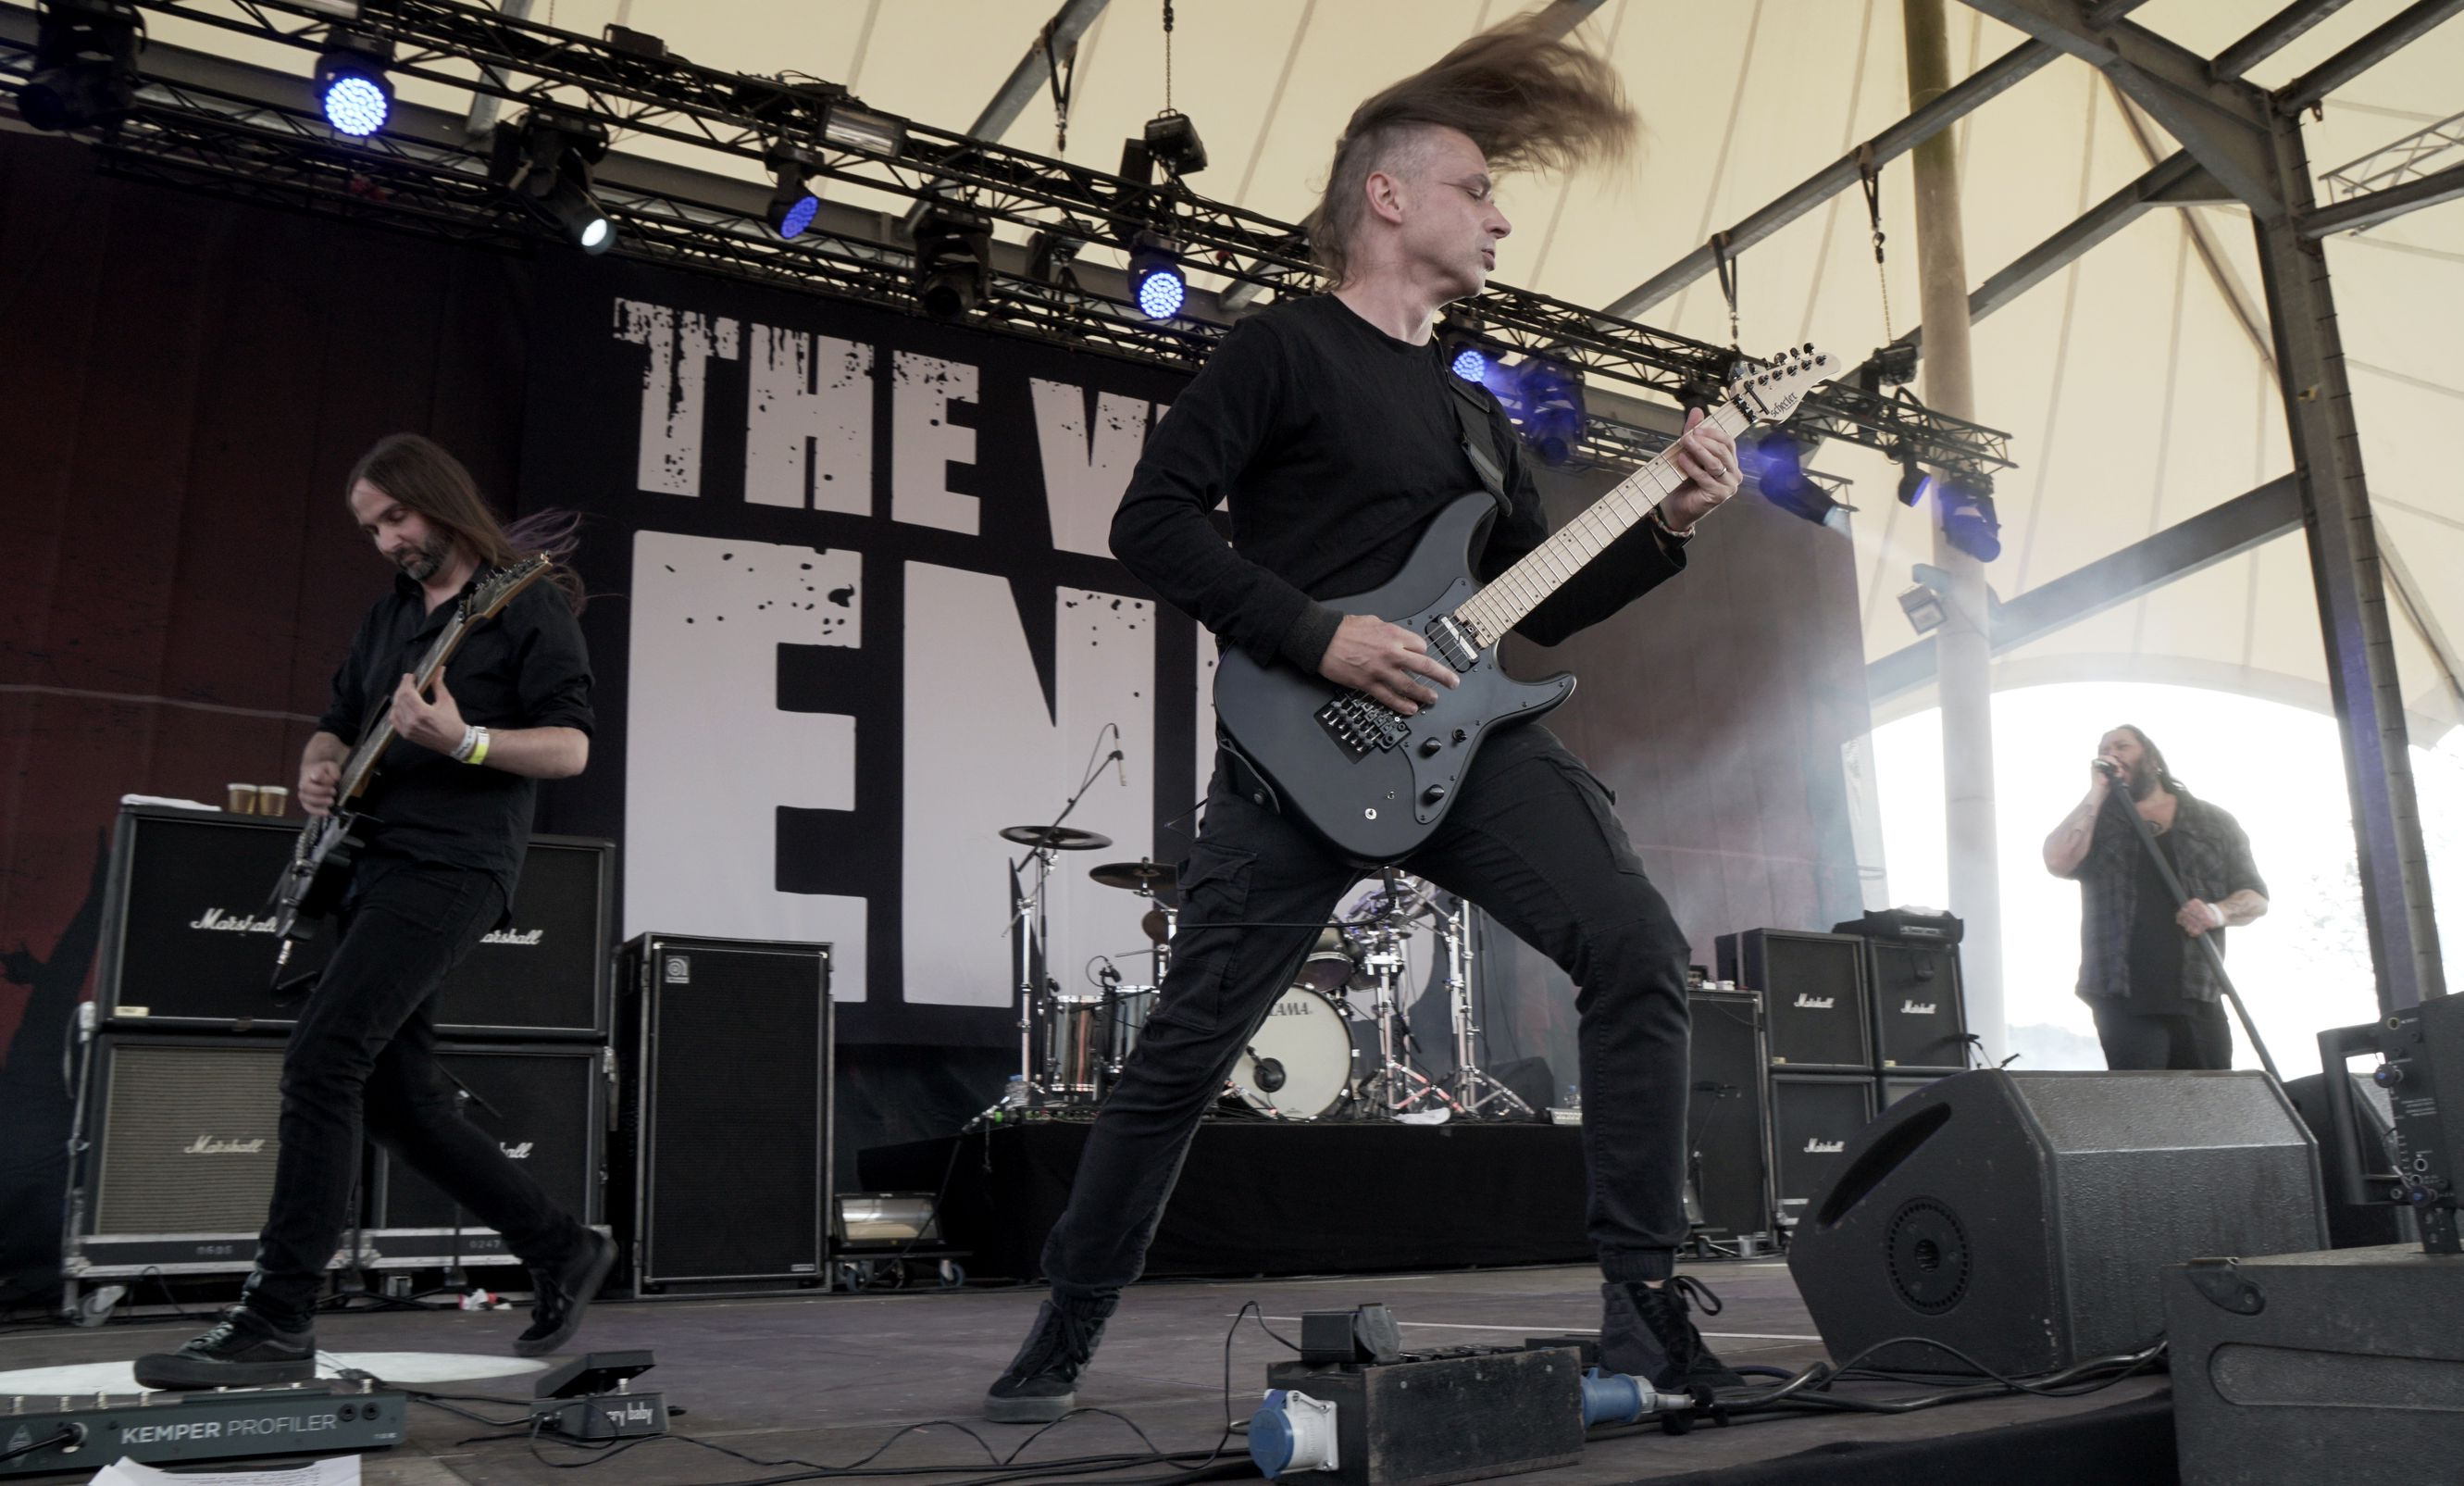 Rock-Hard-Festival-2021-One-Day-The-Very-End-Asphyx-Rage-Motorjesus-Wolfskull-Darkness-Scorched-Oak-Amphitheater-Gelsenkirchen_11